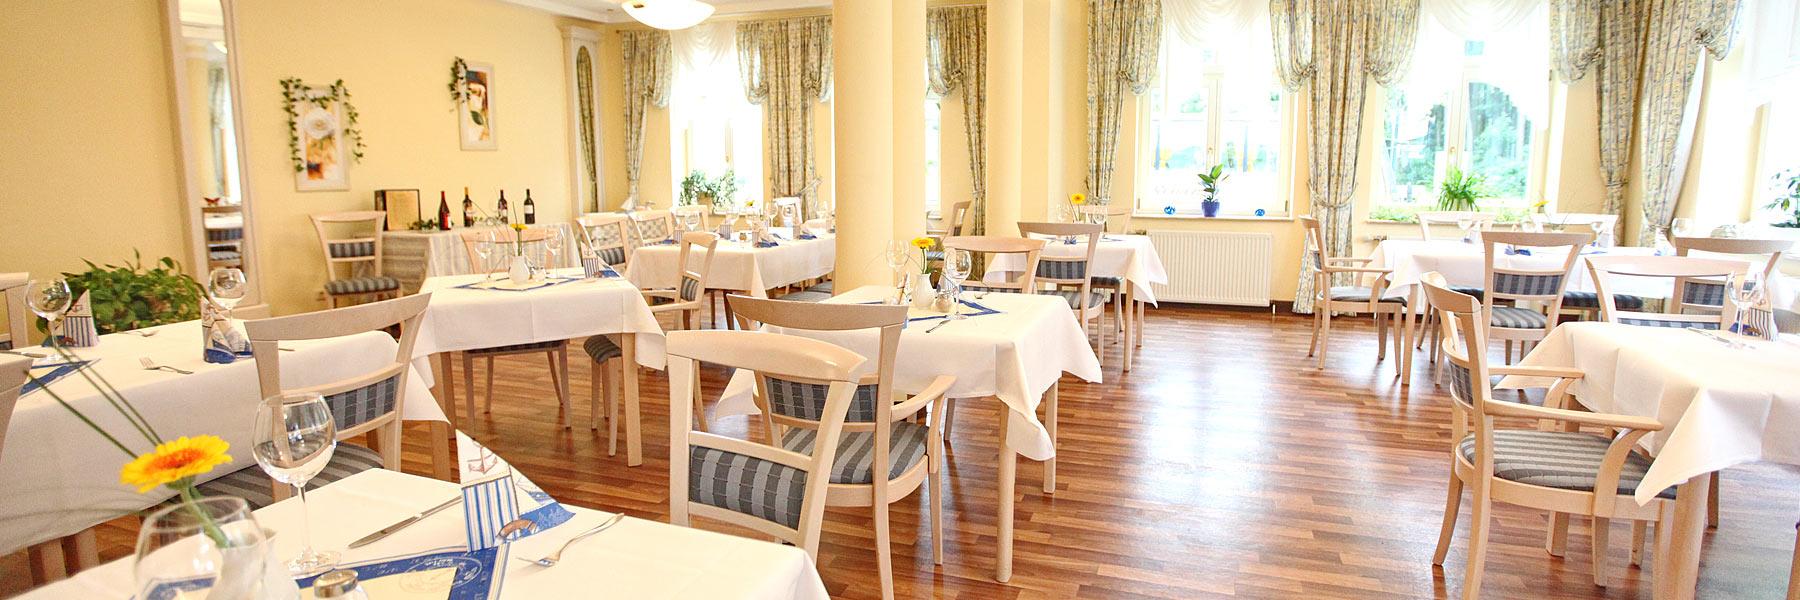 Restaurant - Strandhotel Plau am See